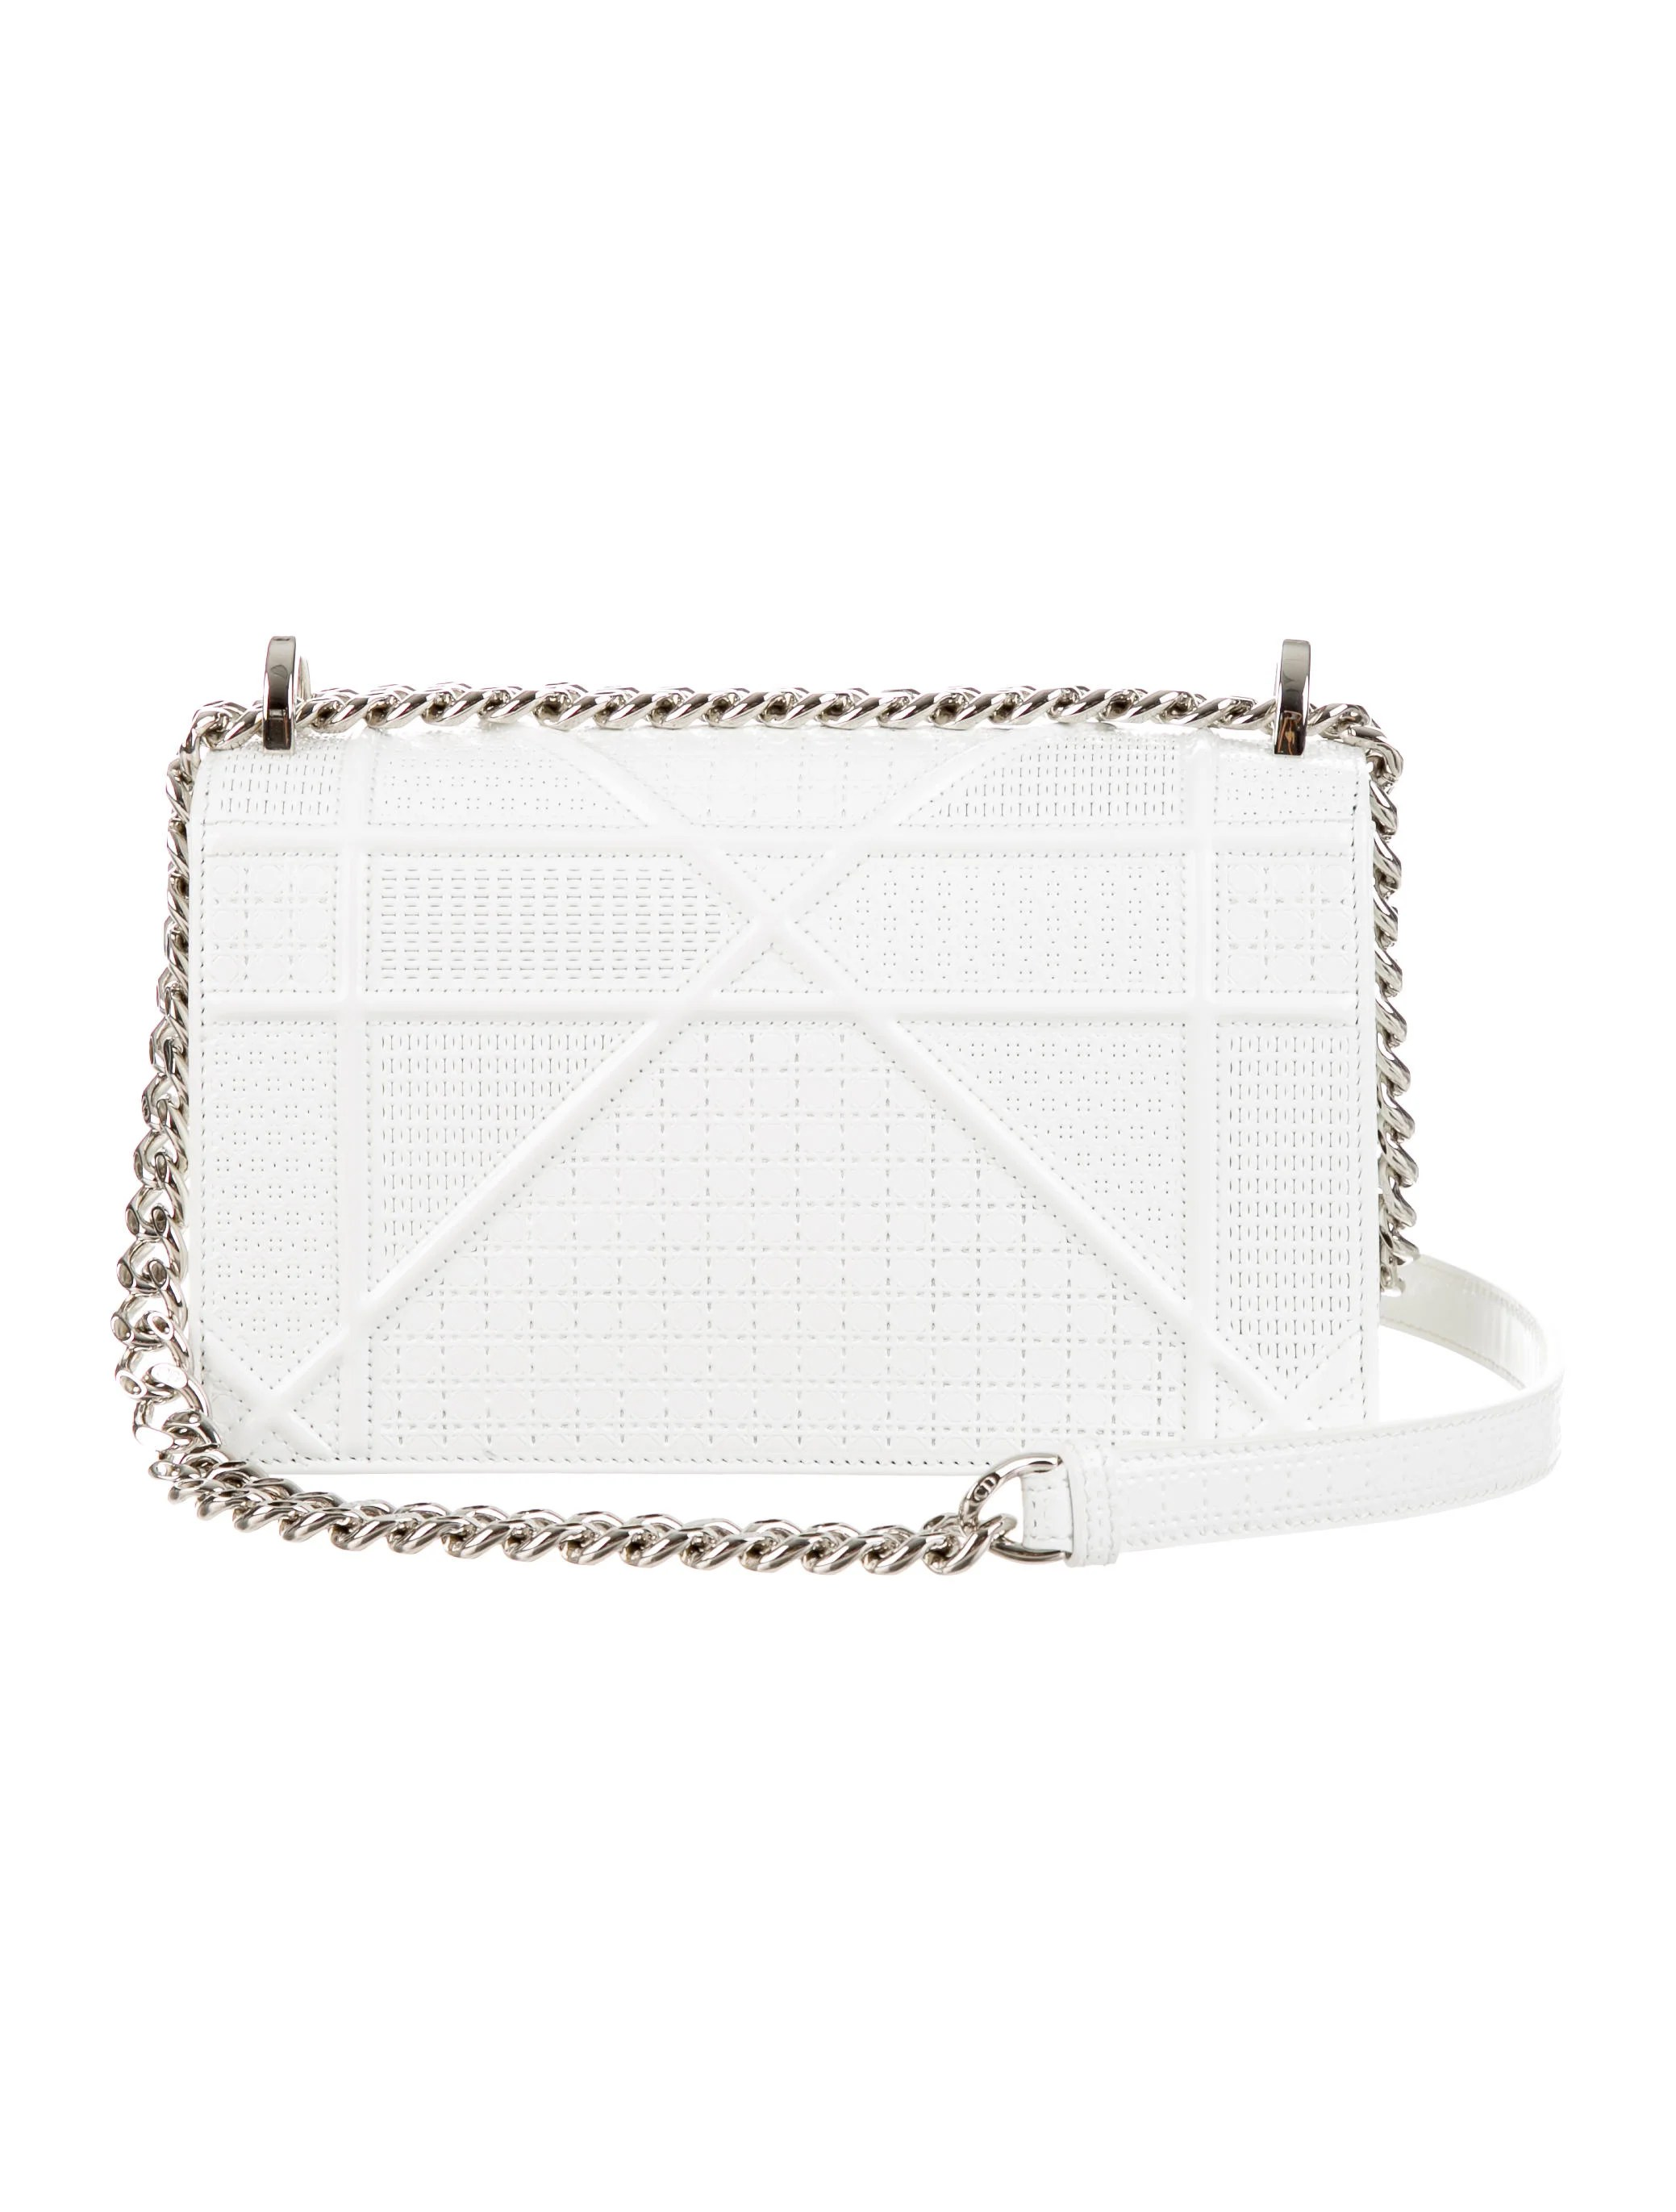 Christian Dior Small Diorama Bag